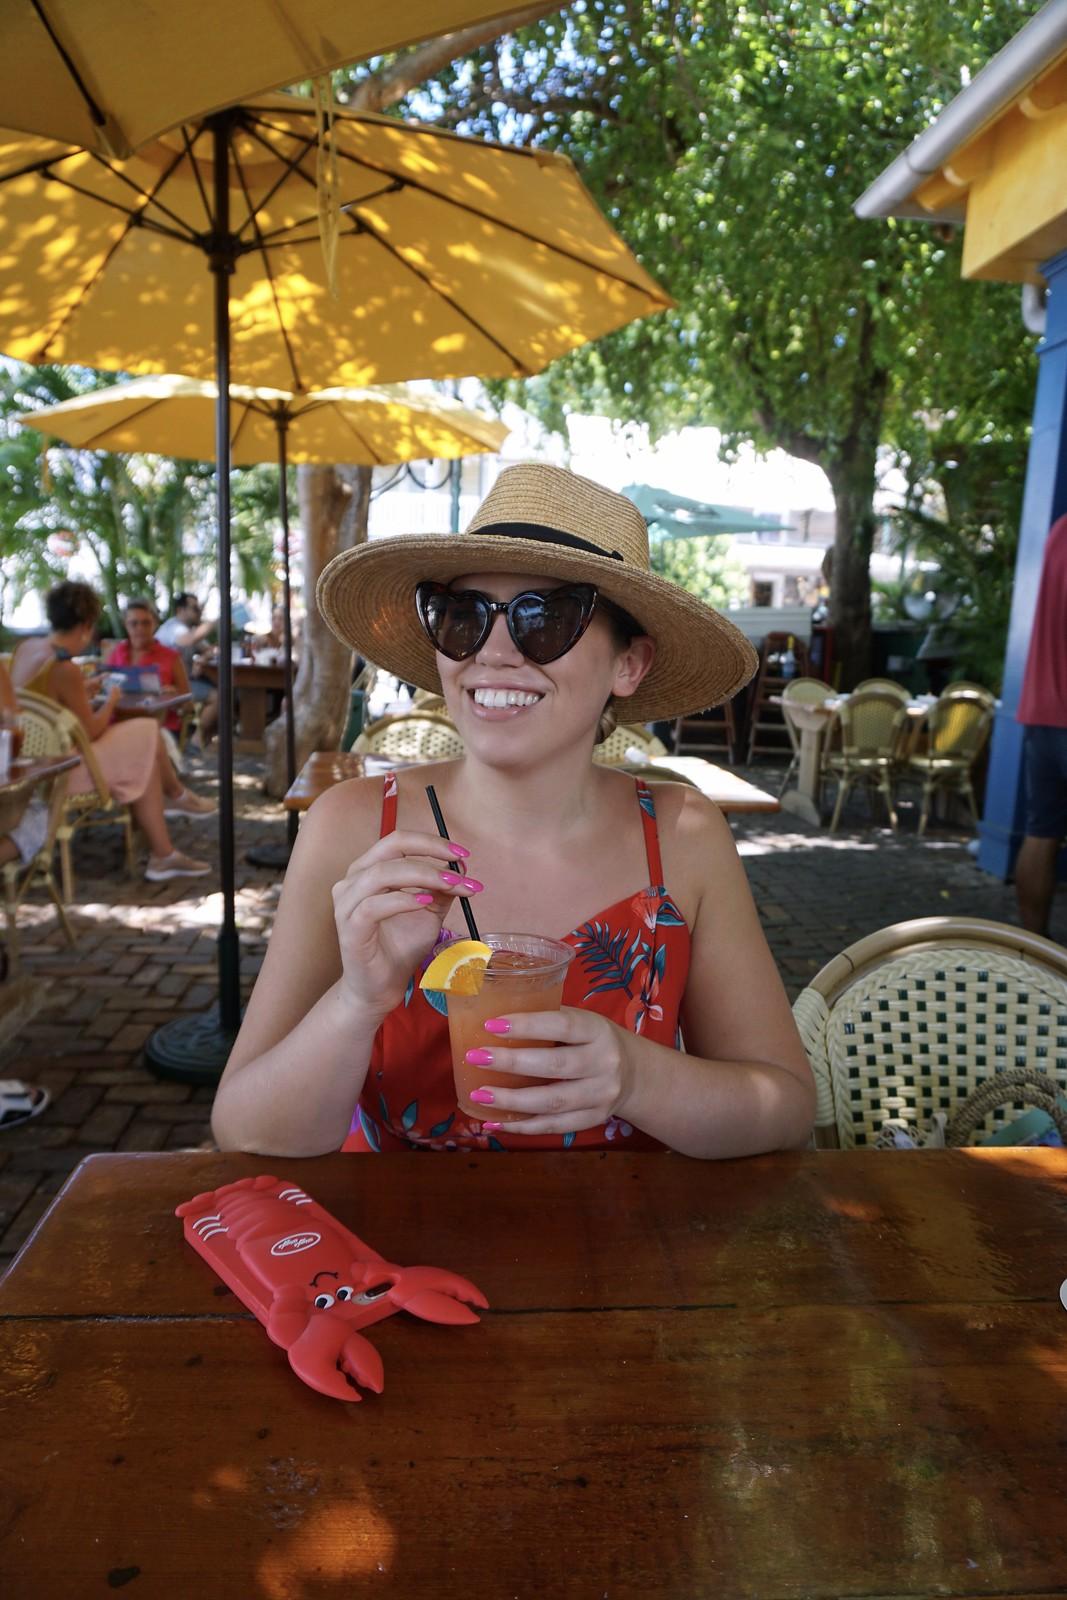 blue-macaw-restaurant-rum-runner-ultimate-road-trip-5-days-florida-keys-itinerary-what-to-do-key-west-key-largo-islamorada-marathon-miami-vacation-guide